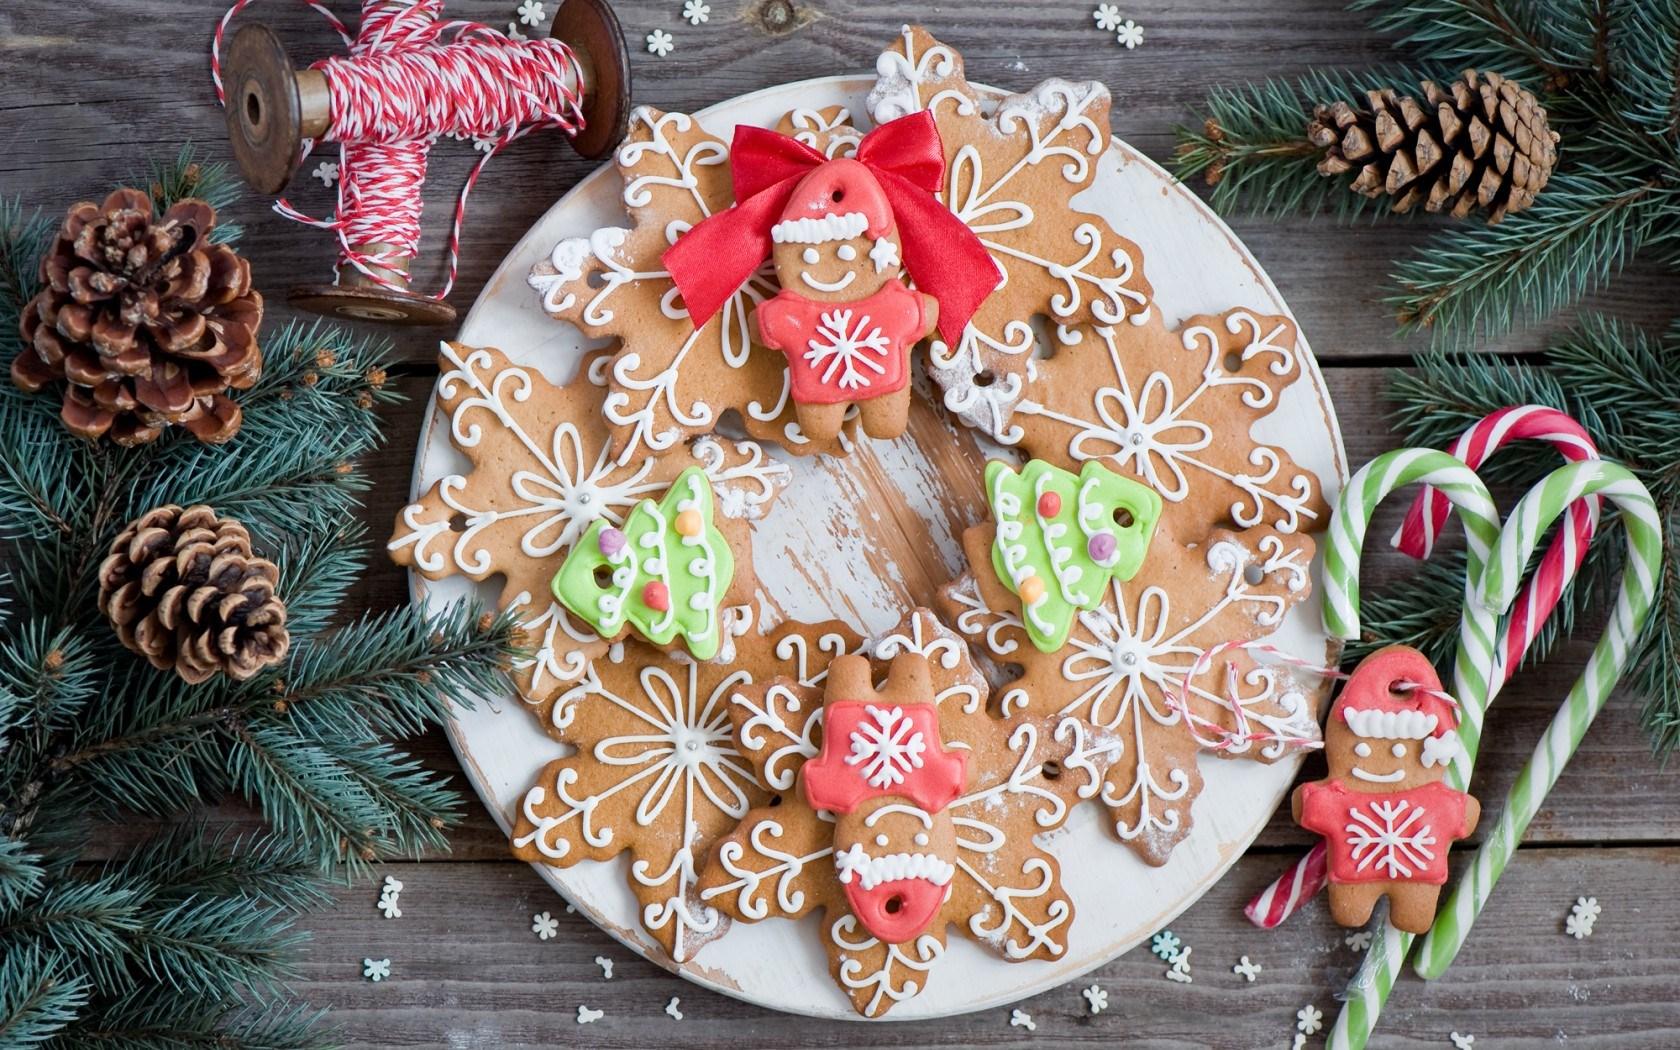 New Year Christmas Cookies Figurines Snowflakes Dessert